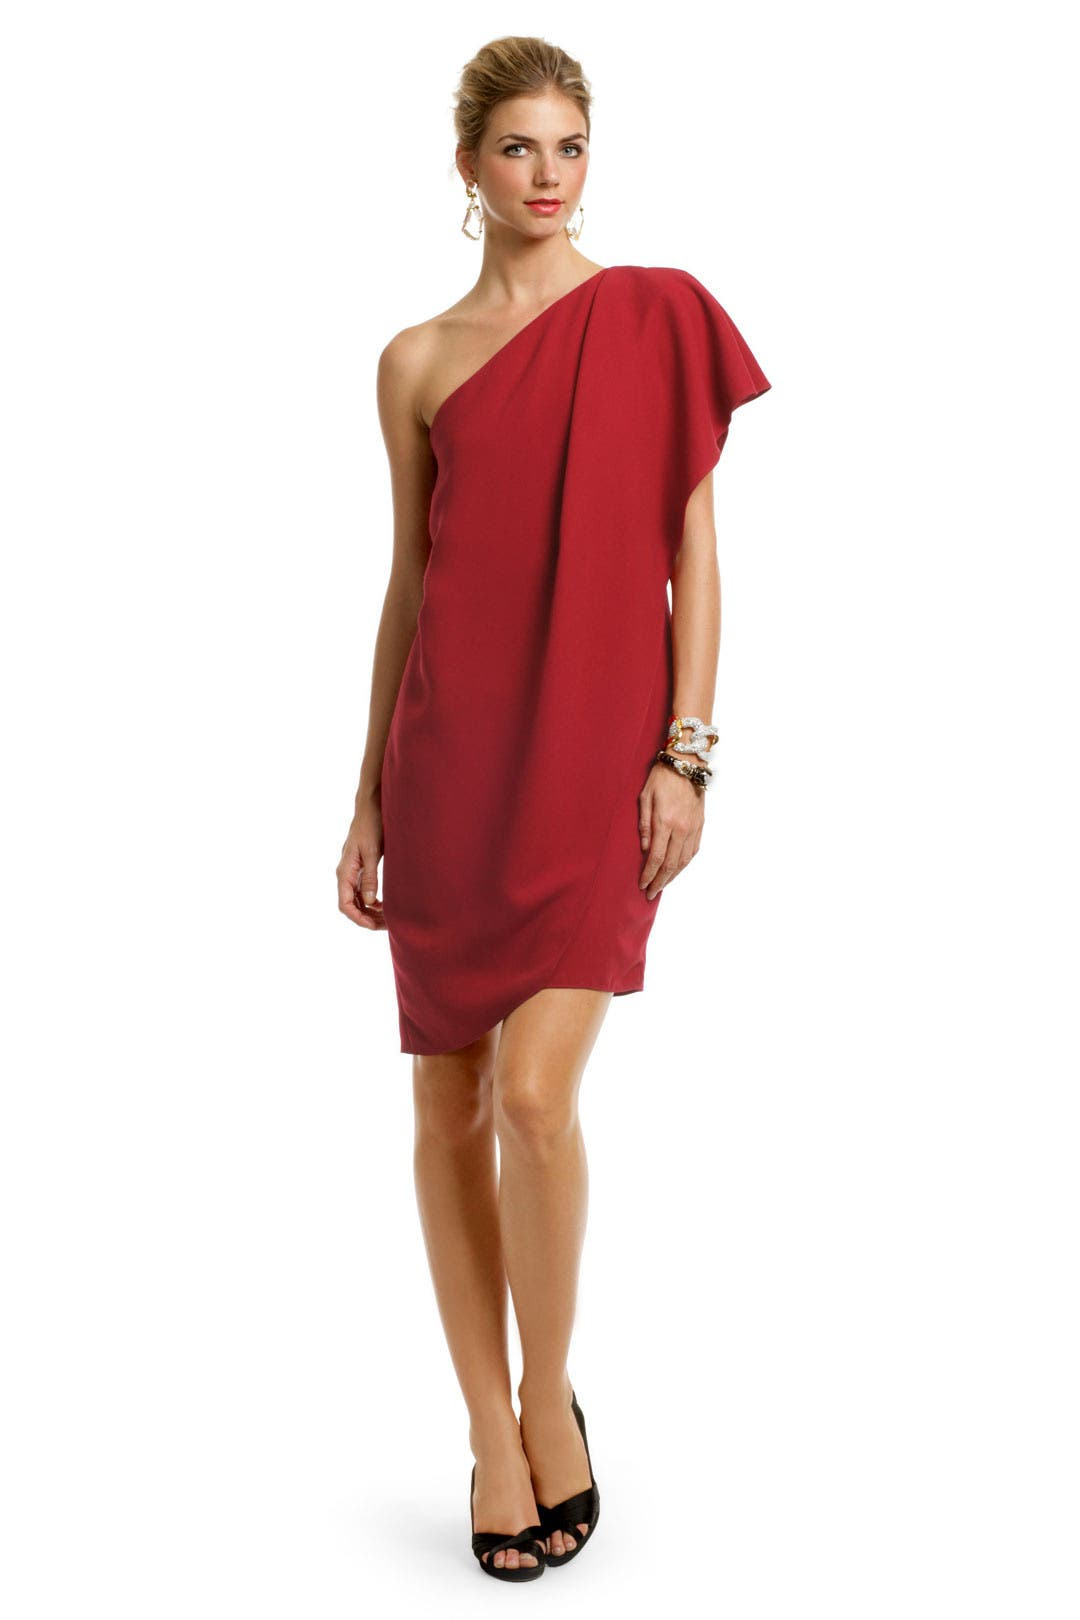 Crimson Catwalk Dress by Mark & James by Badgley Mischka